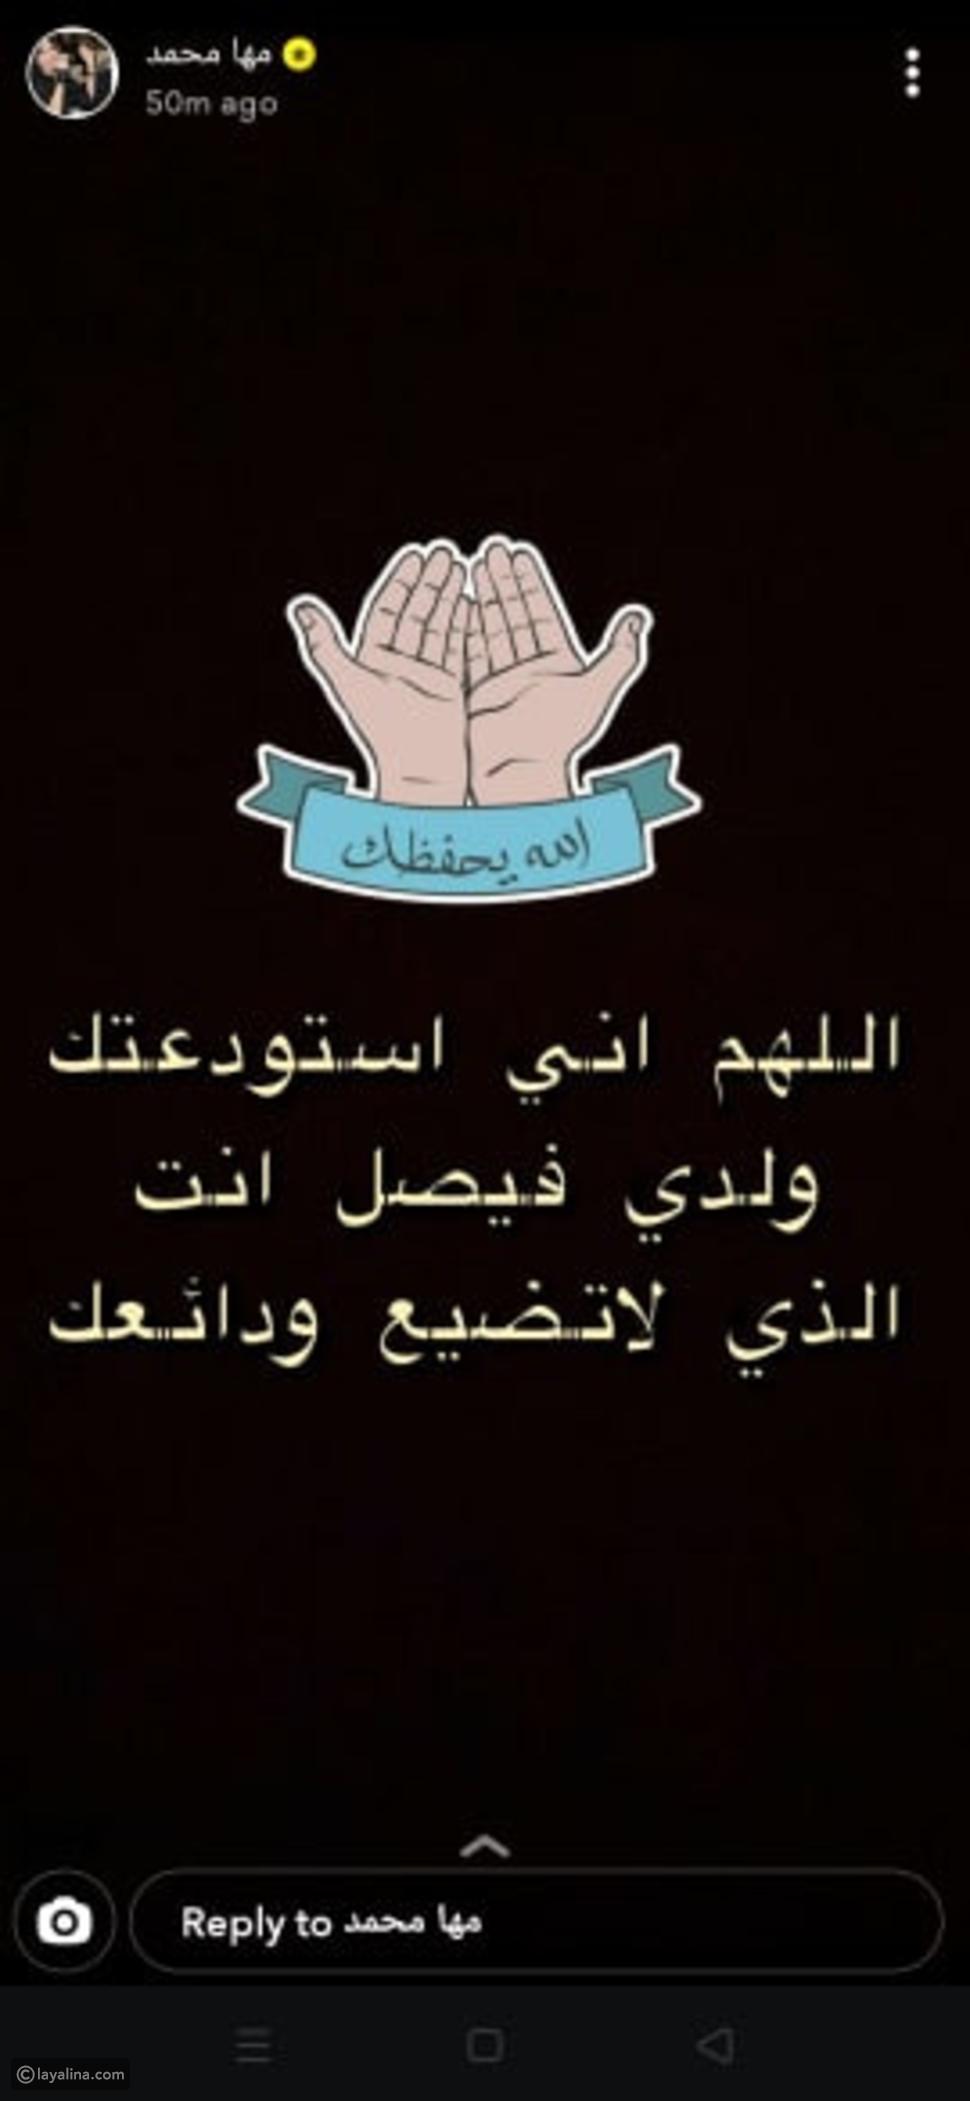 مها محمد تدعو لابنها بعد إصابته بفيروس كورونا